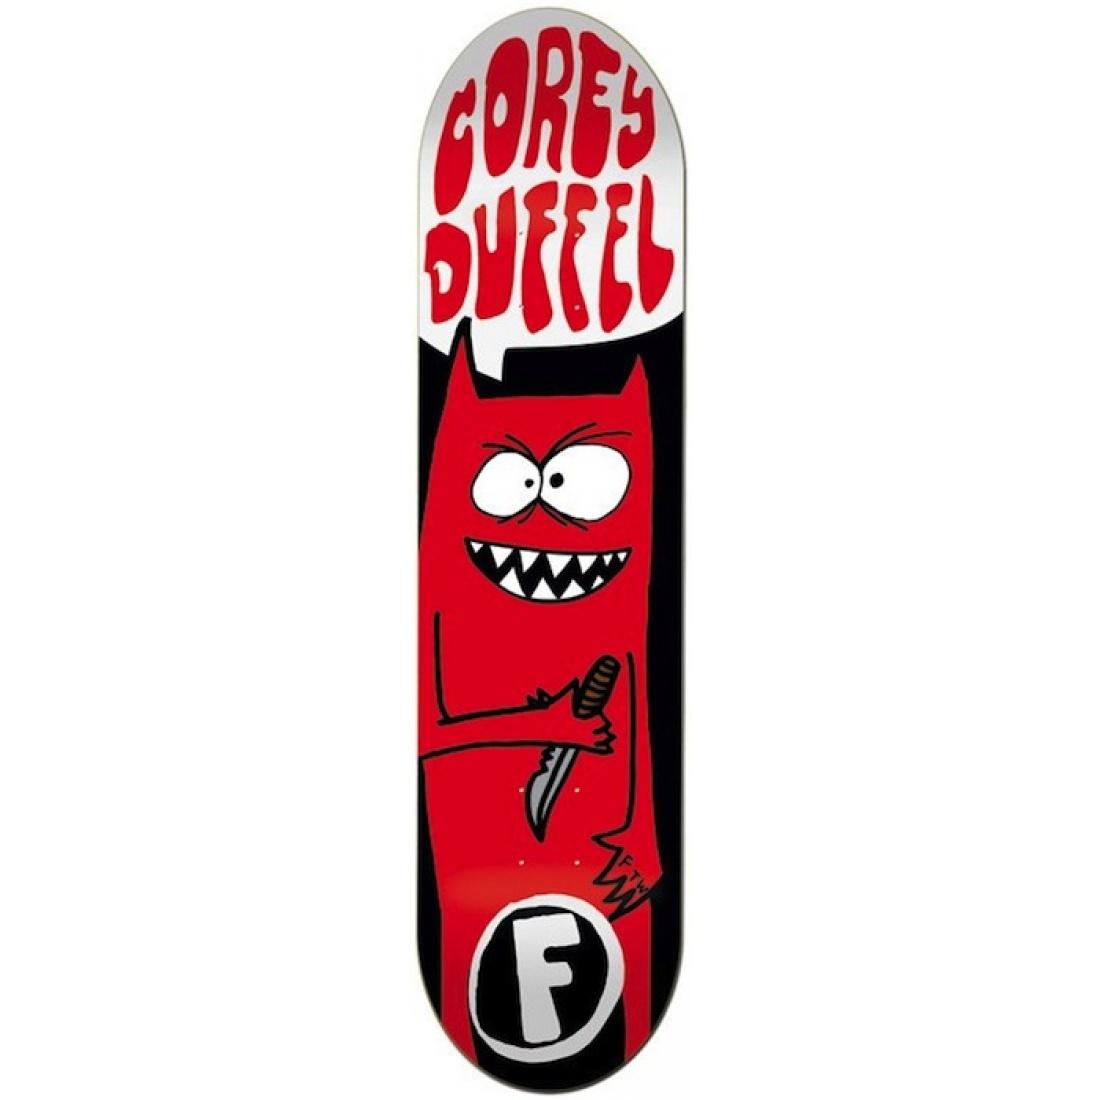 FS-Duffle Yuck 8.3 Deck